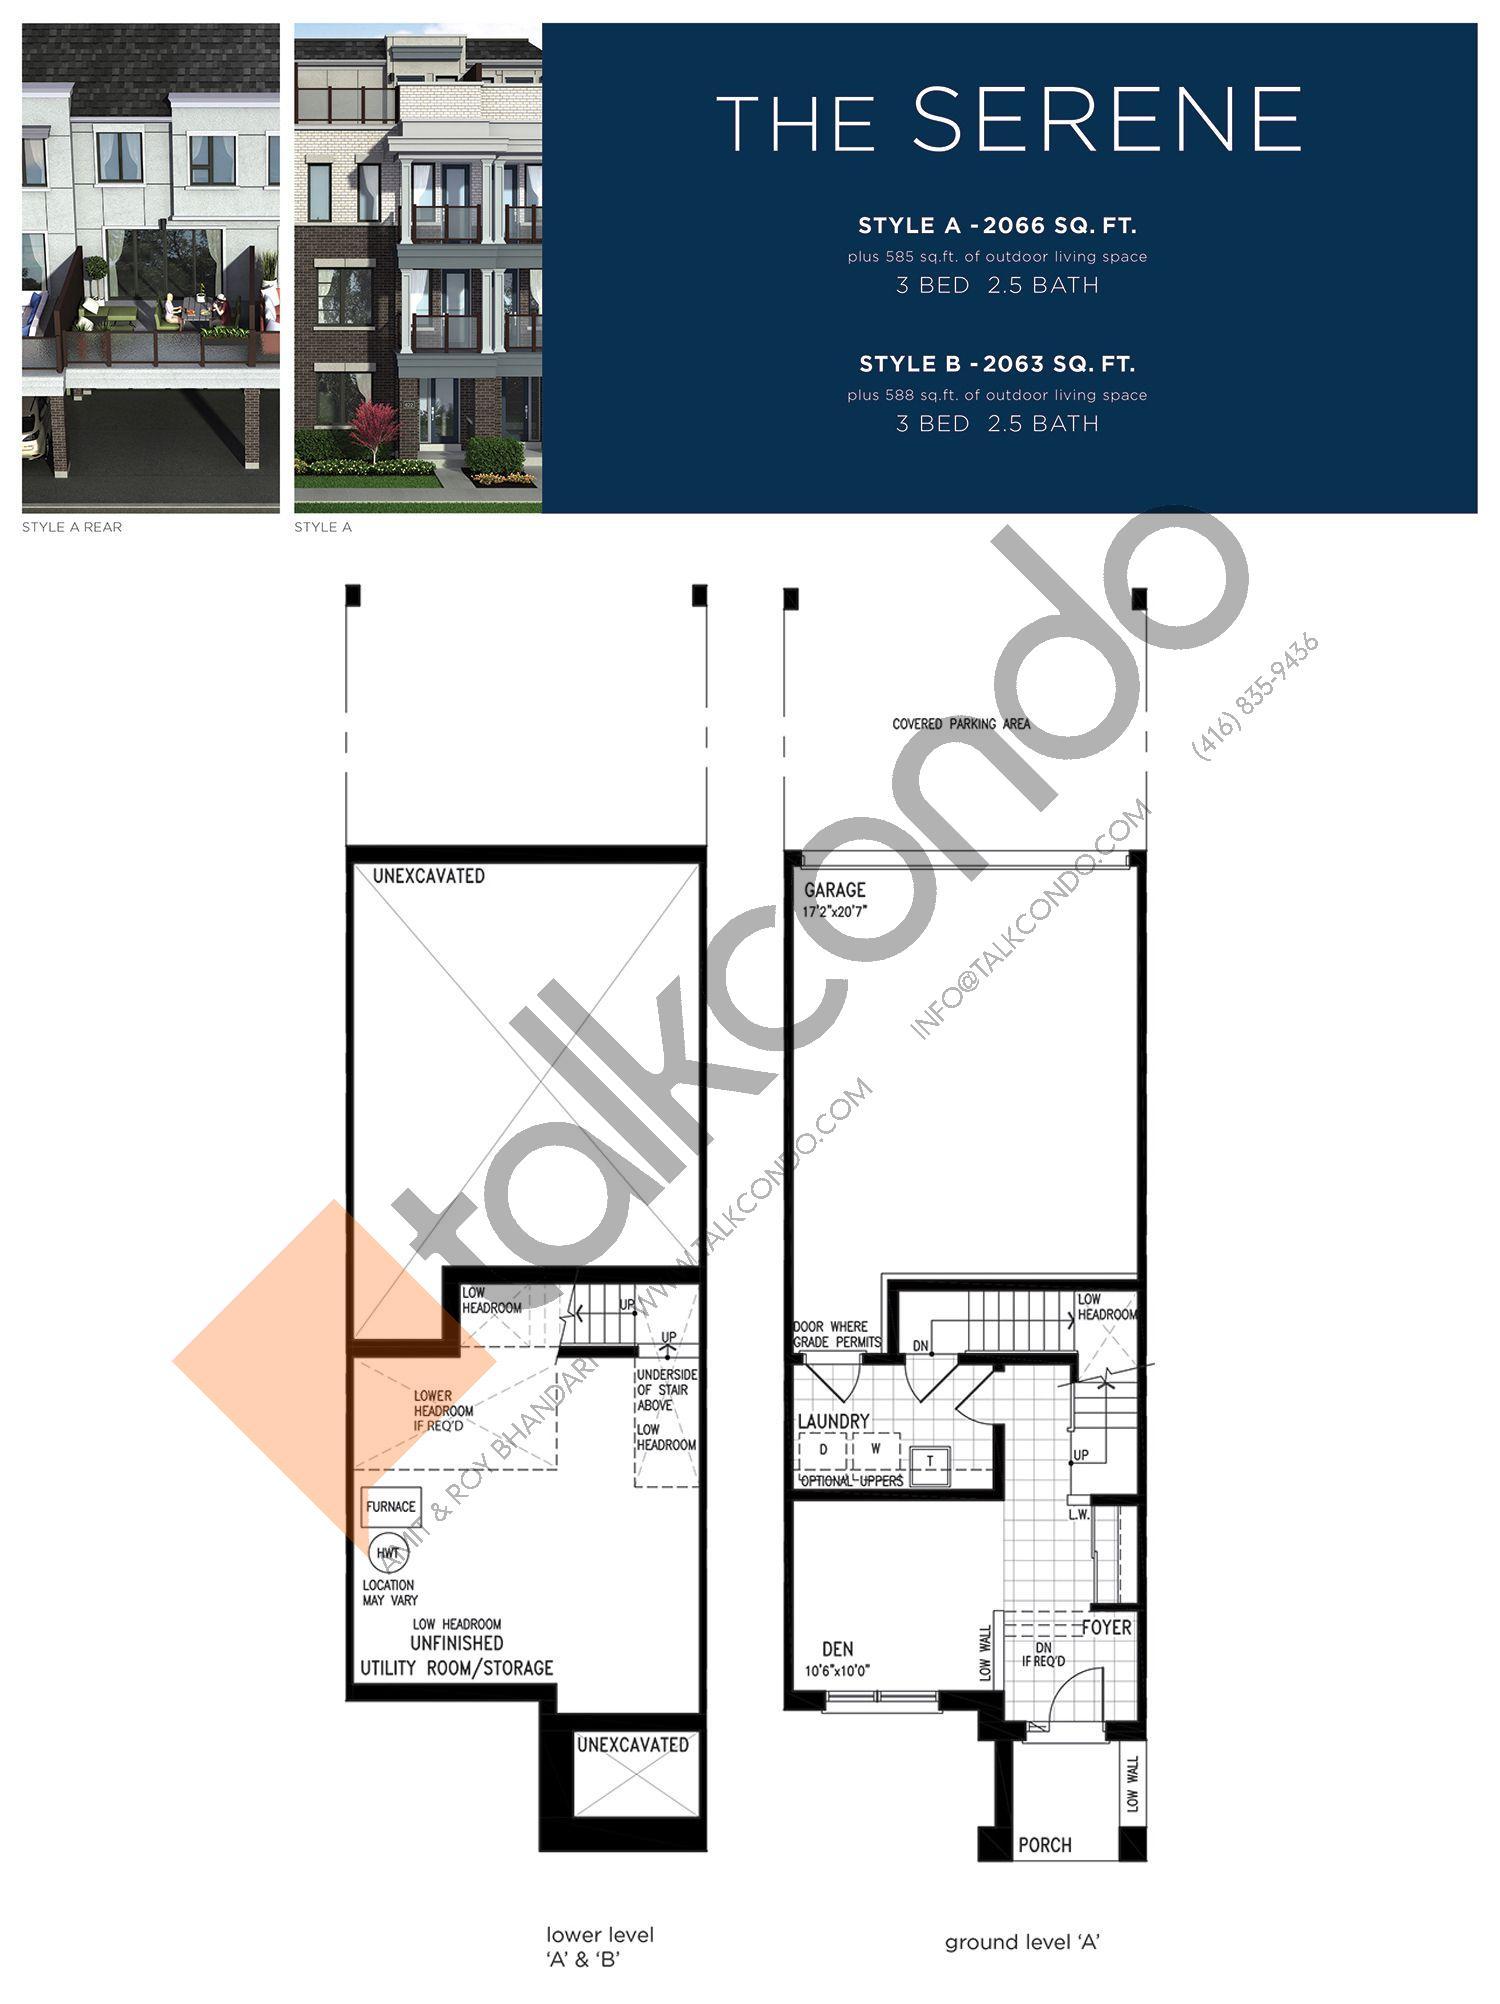 The Serene (1/3) Floor Plan at Lake Breeze - 2066 sq.ft